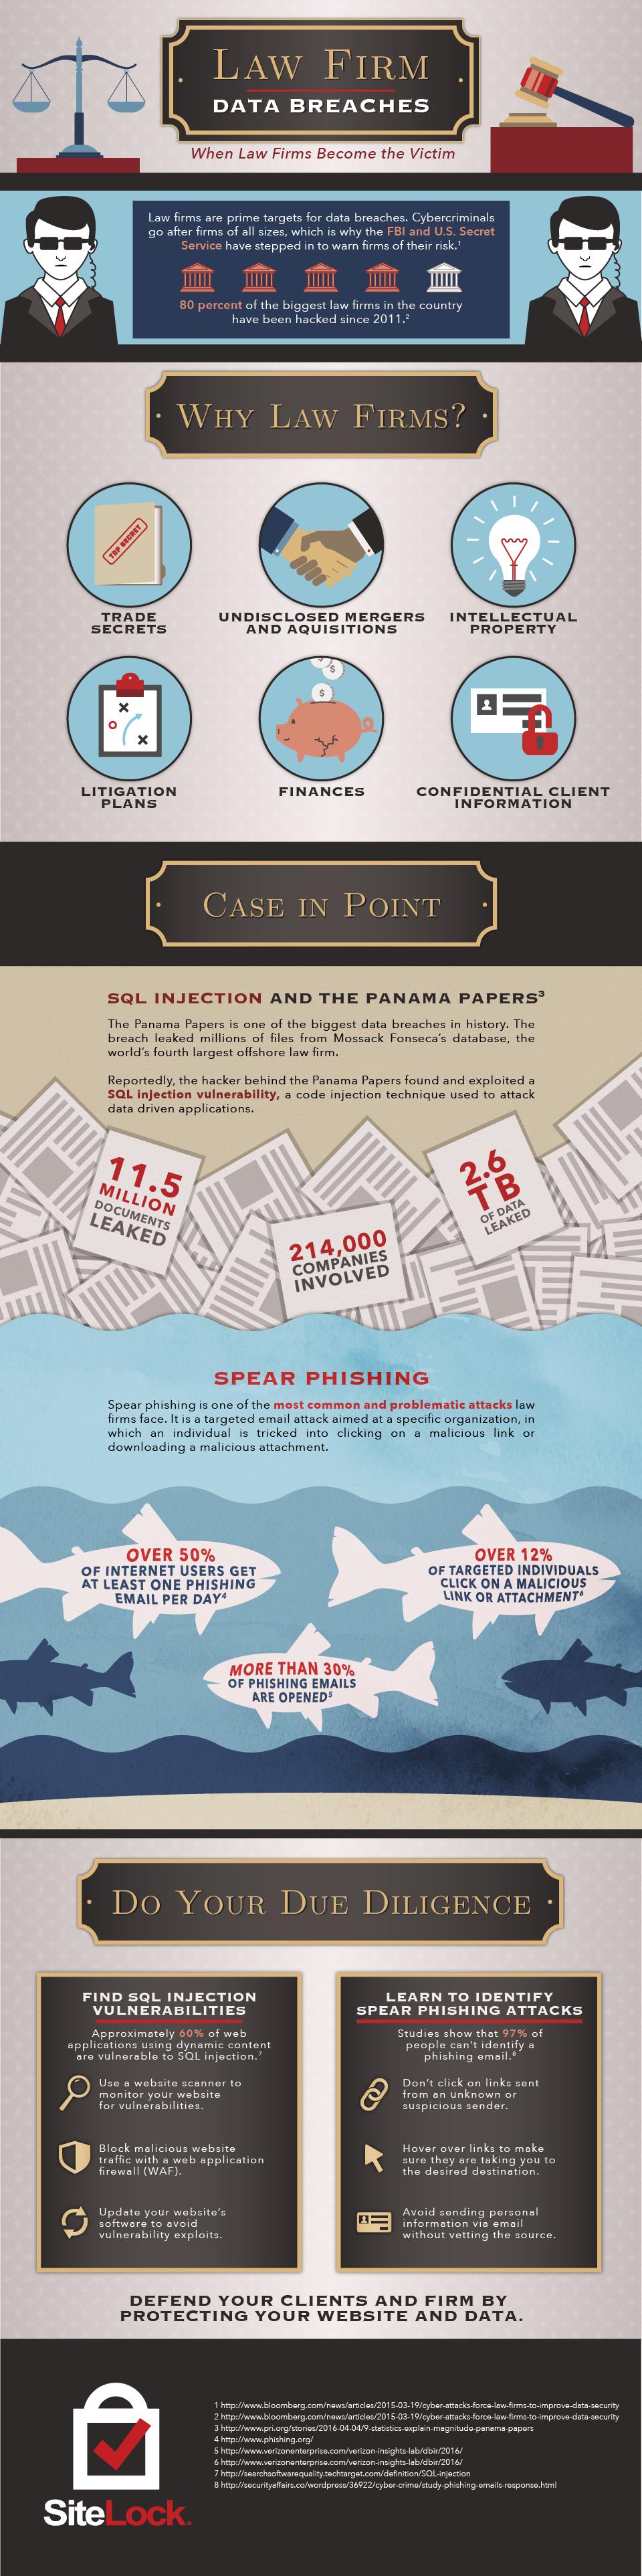 Law firm Data Breaches